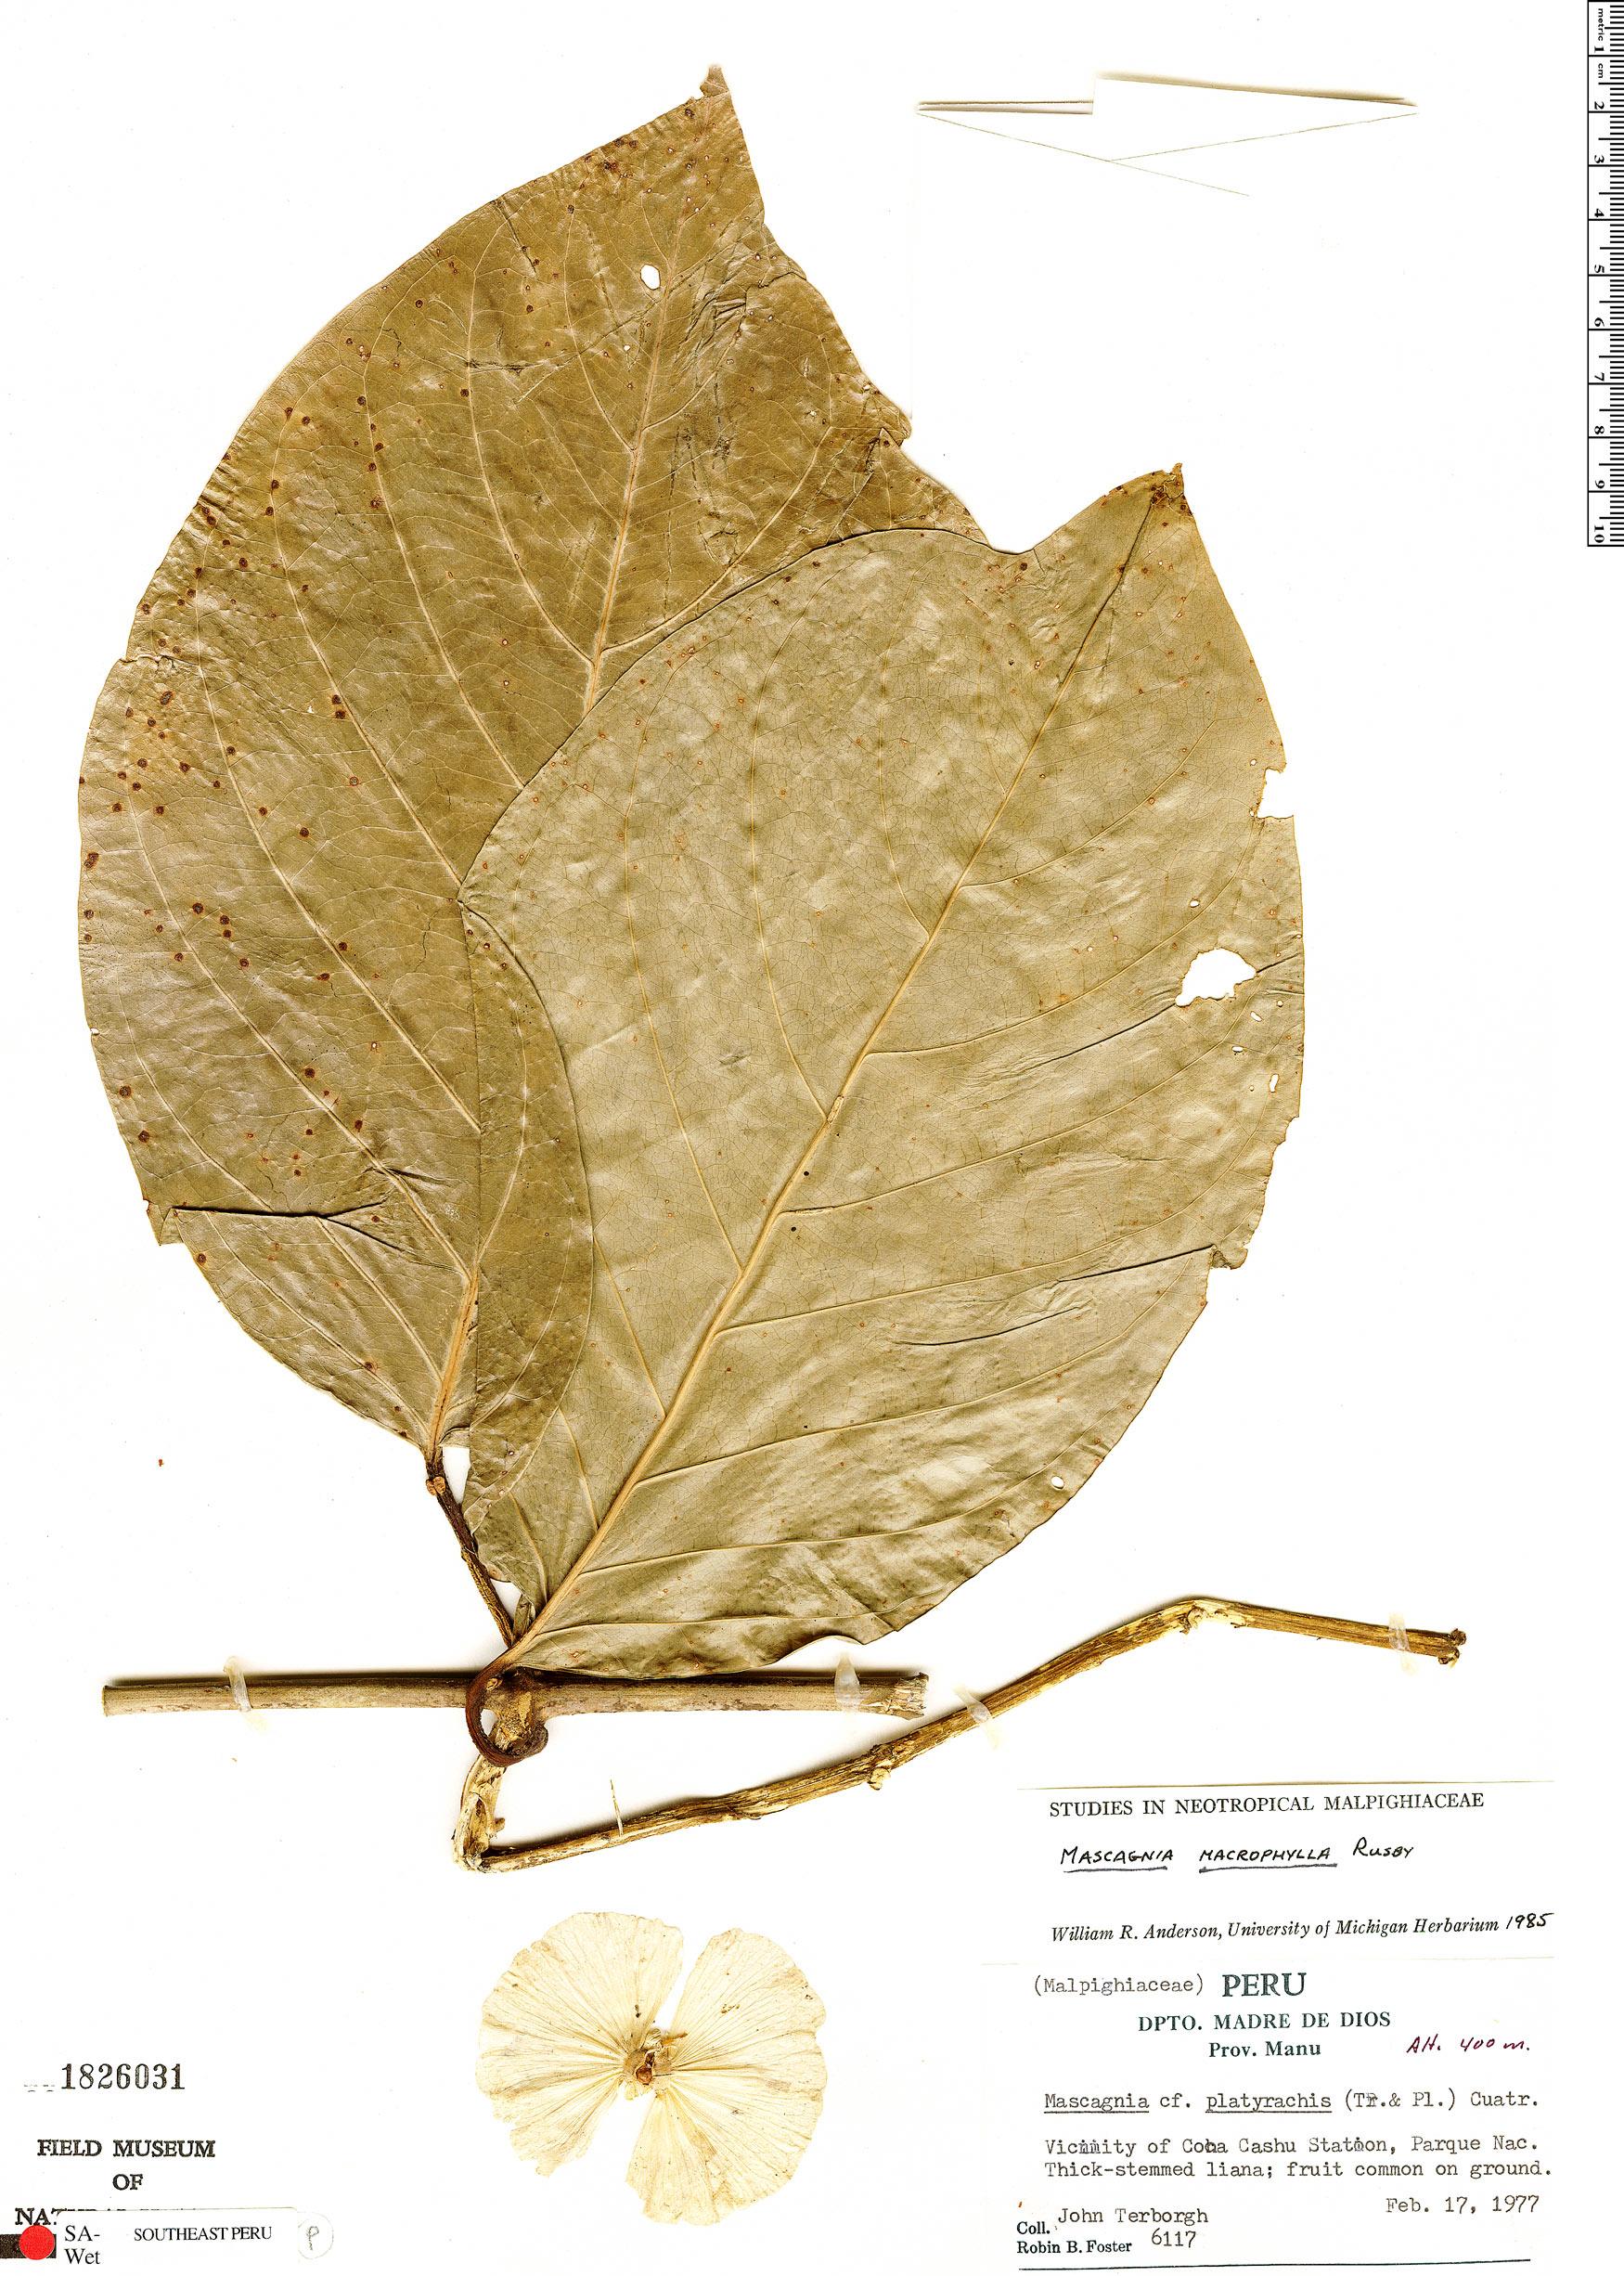 Specimen: Adelphia macrophylla